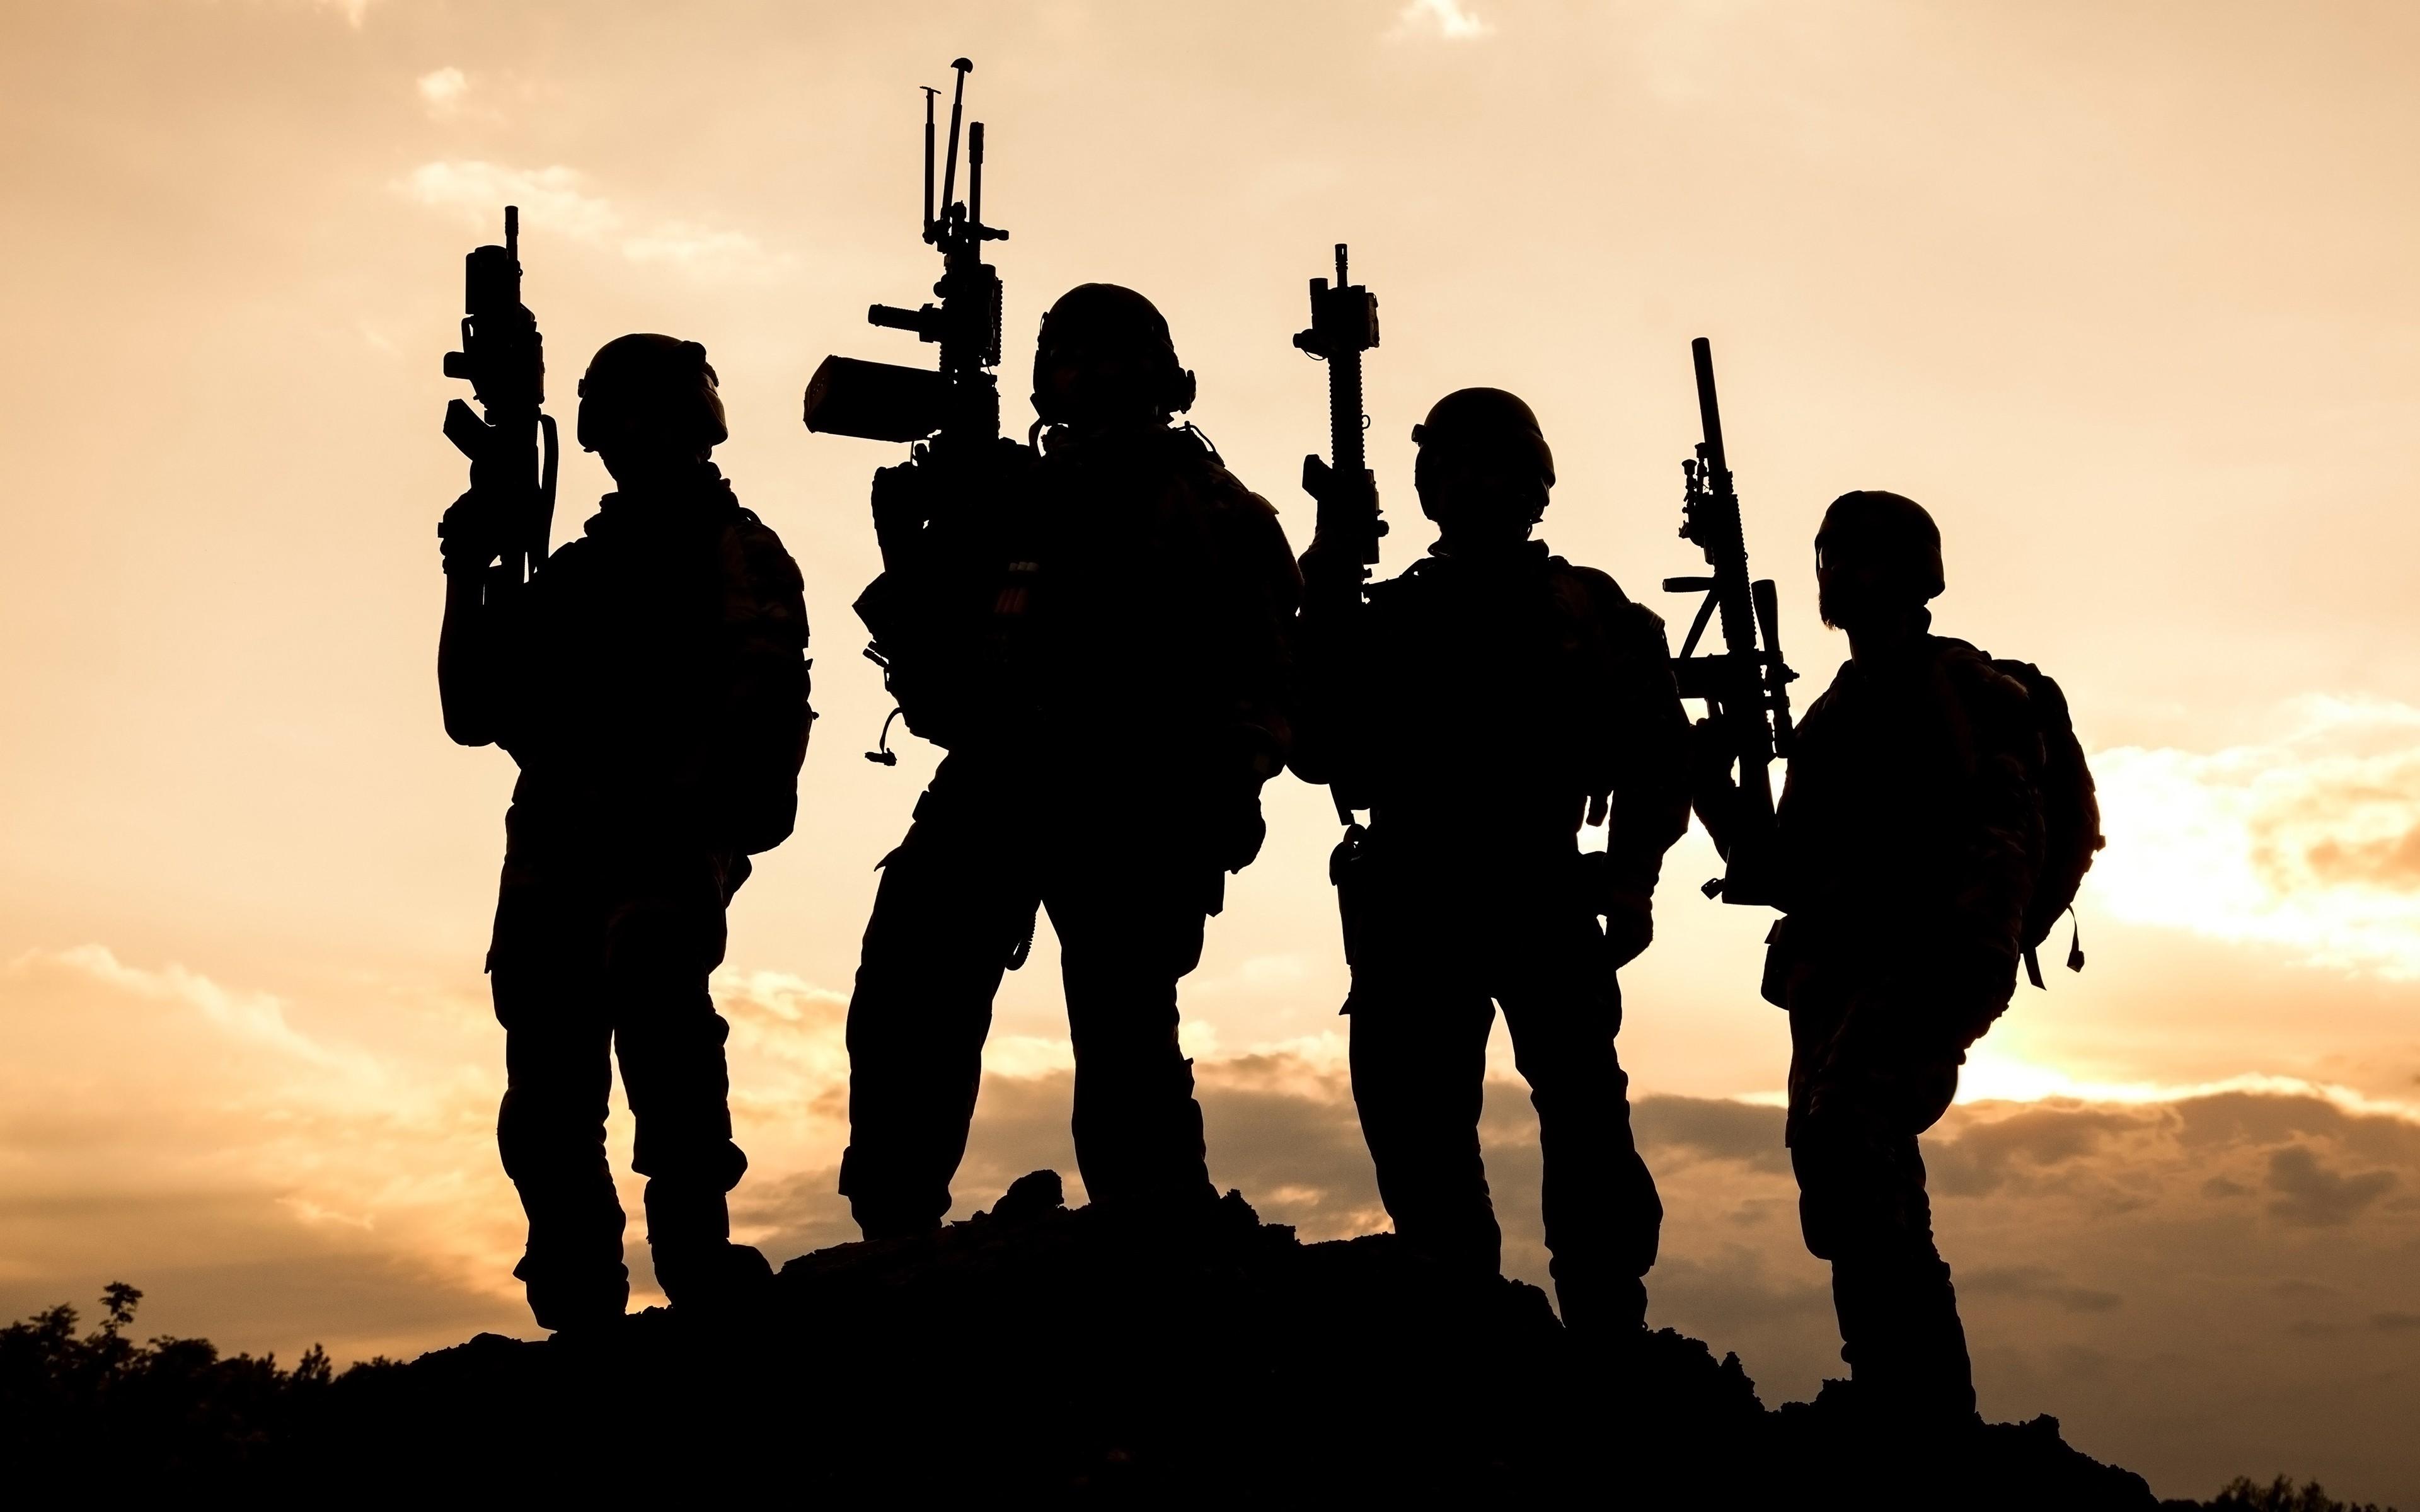 Wallpaper 3840x2400 Px Assault Rifle Military Silhouette